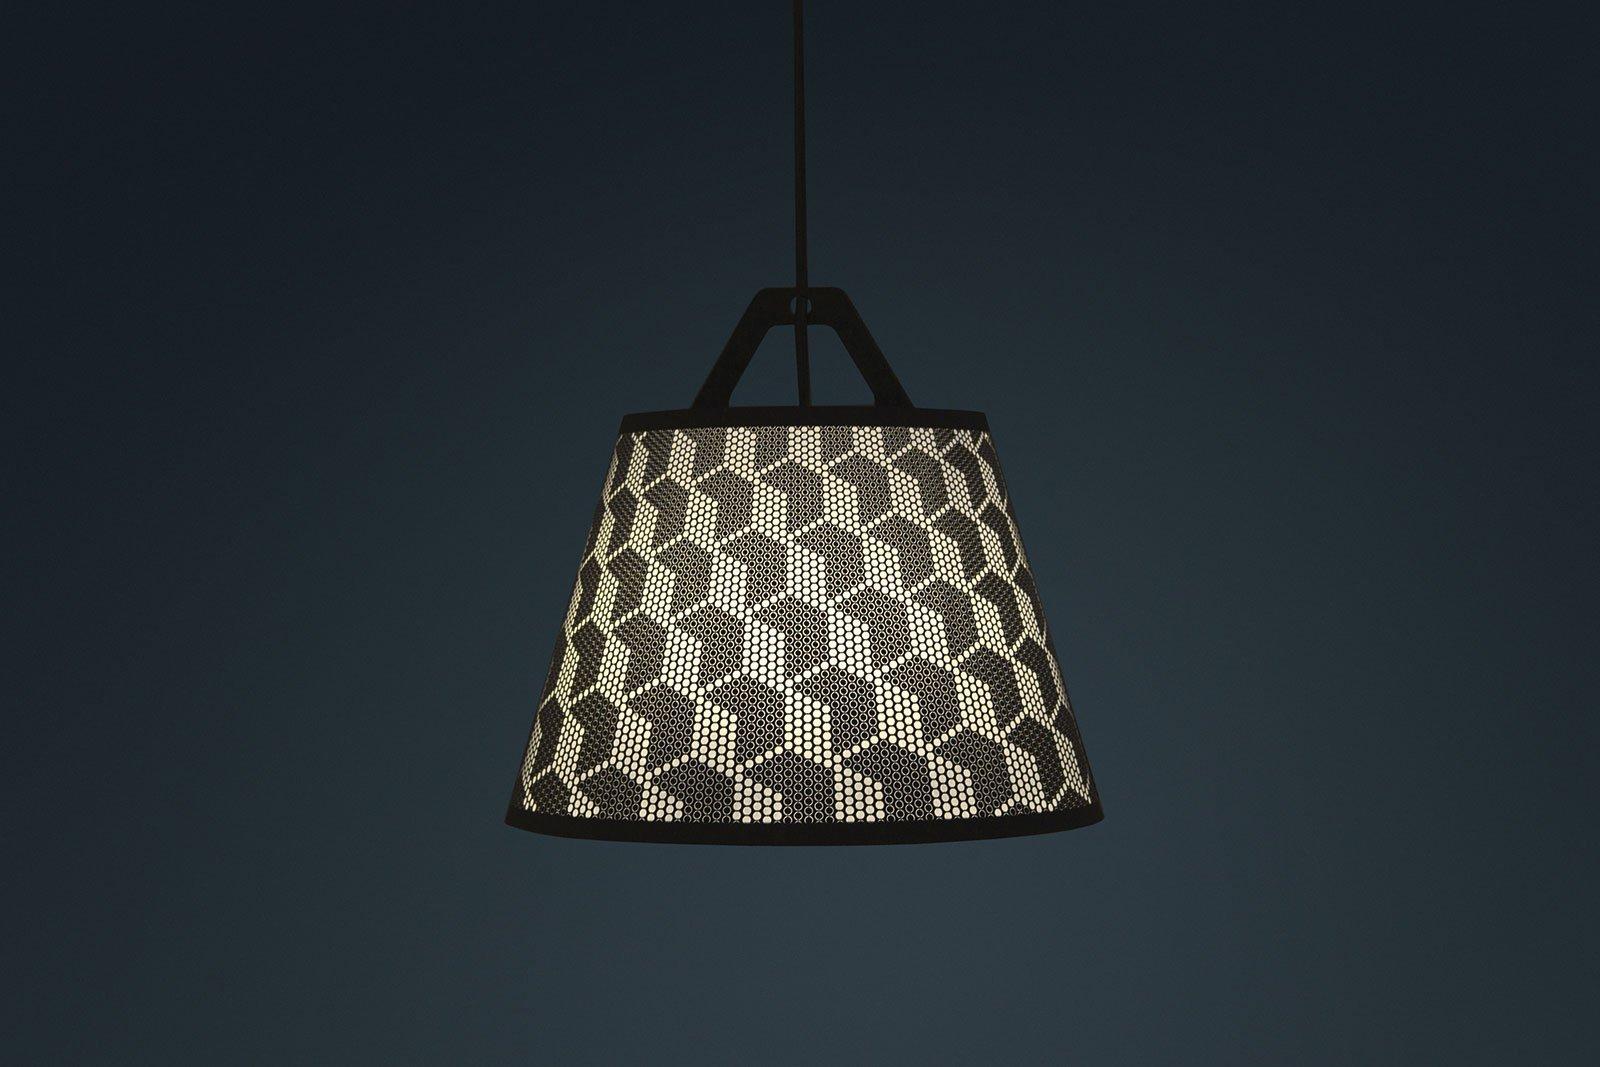 Diy Papercraft Take Off Lamp By Fifti Fifti